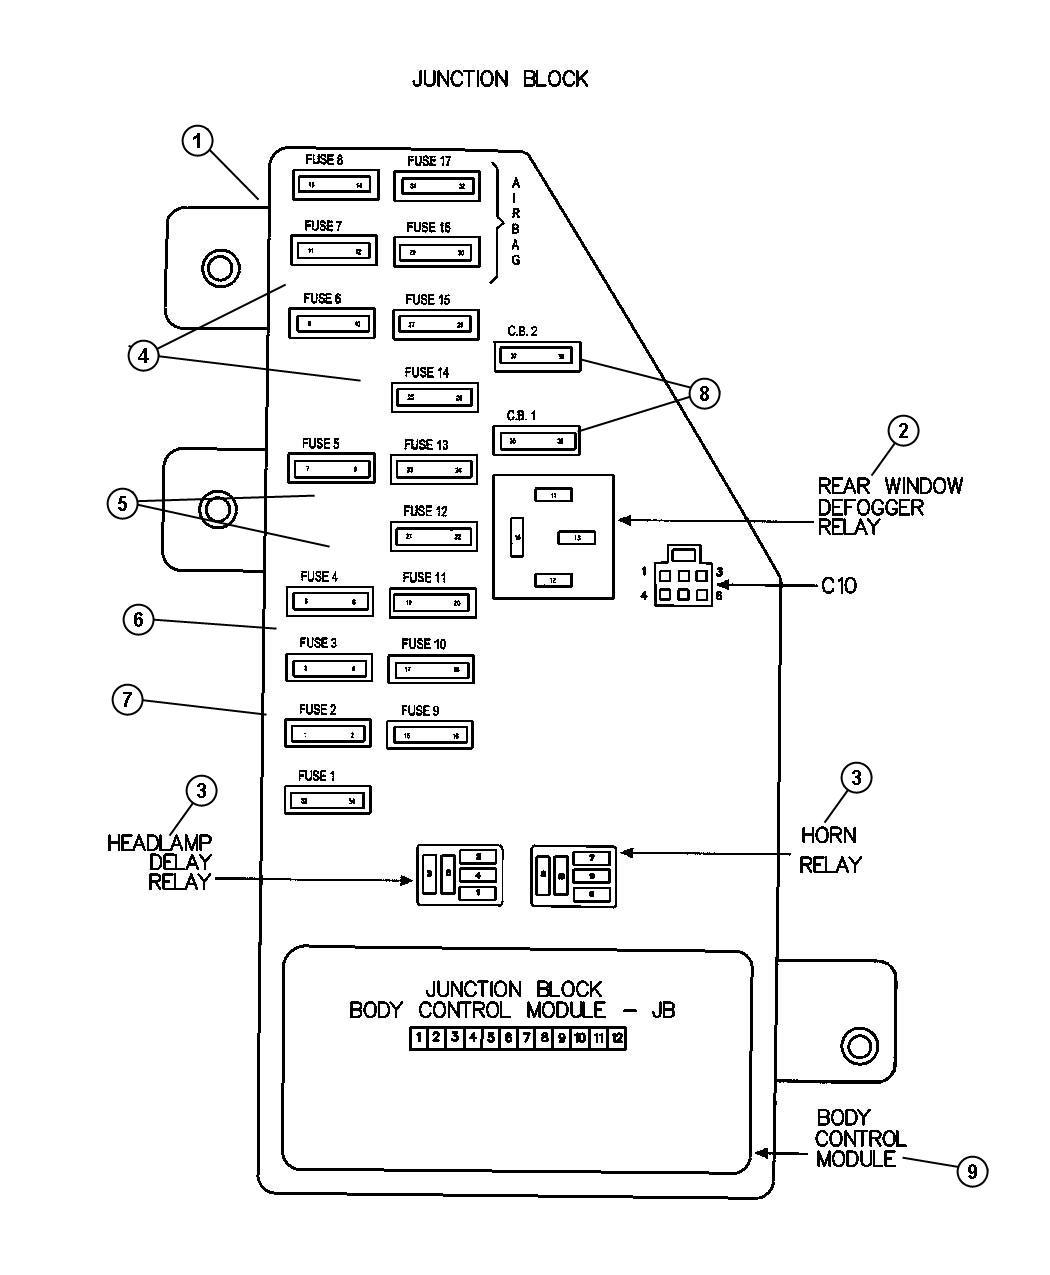 2005 Dodge Dakota Fuse Panel Diagram Hc2401h Honda Engine Wiring Diagram Usb Cable Tukune Jeanjaures37 Fr